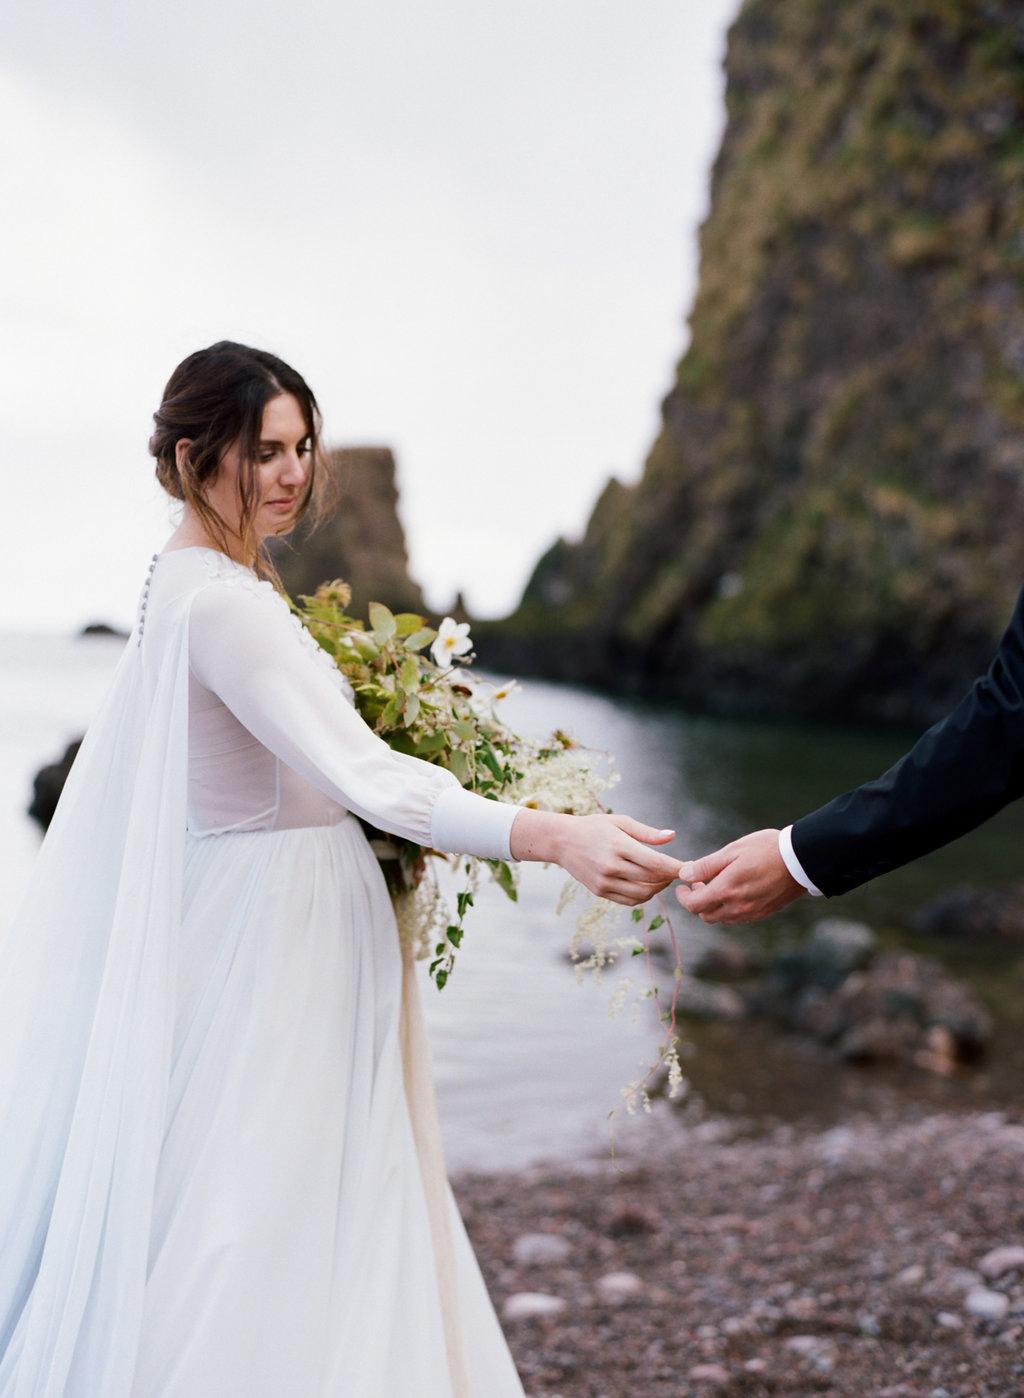 Scotland-Prewedding-highlands-castle-Engagment-Photos-Katie-Grant (92 of 139).jpg